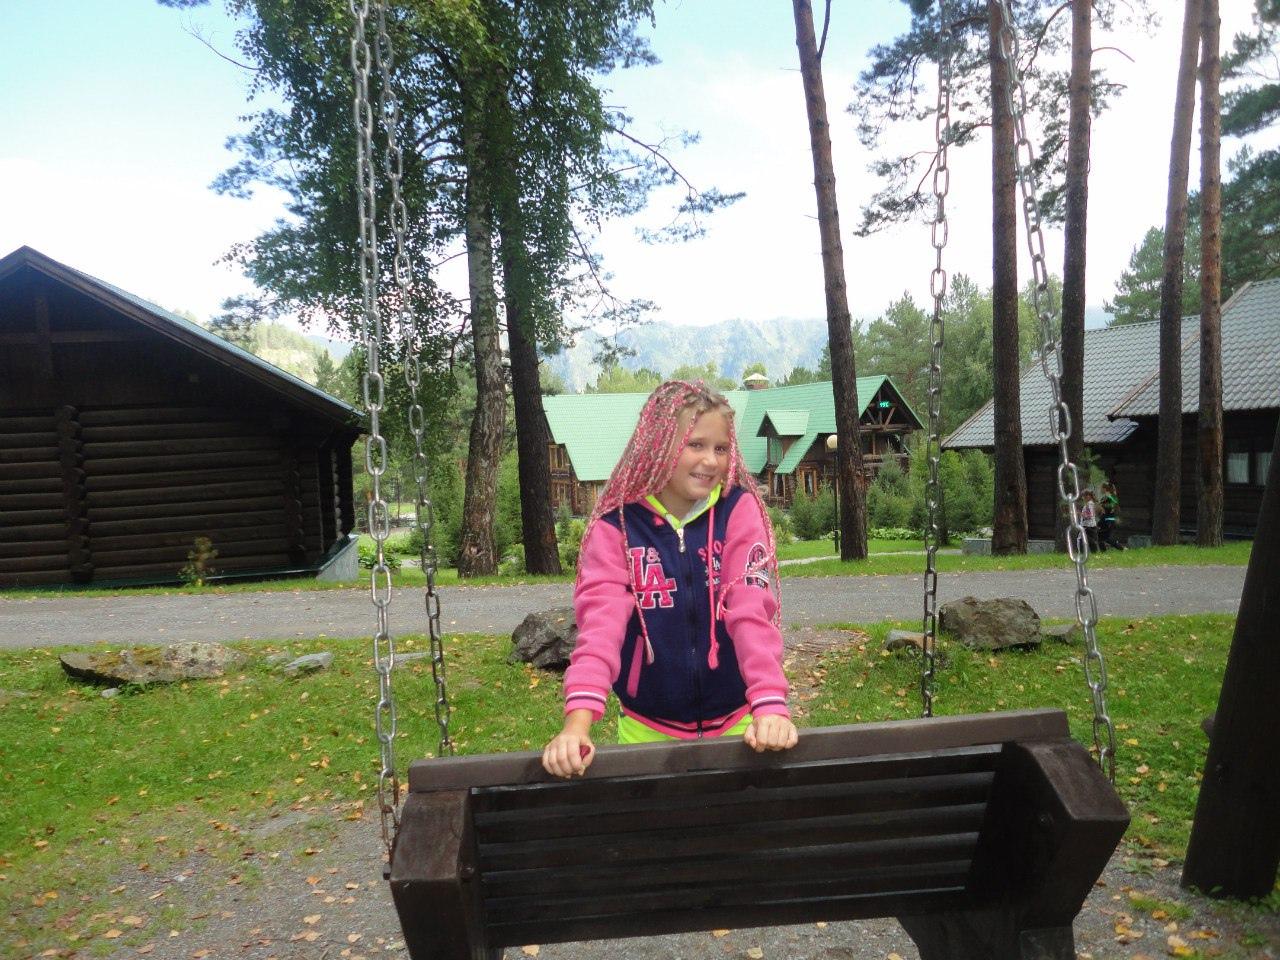 photo from album of Nadezhda Beresneva №7